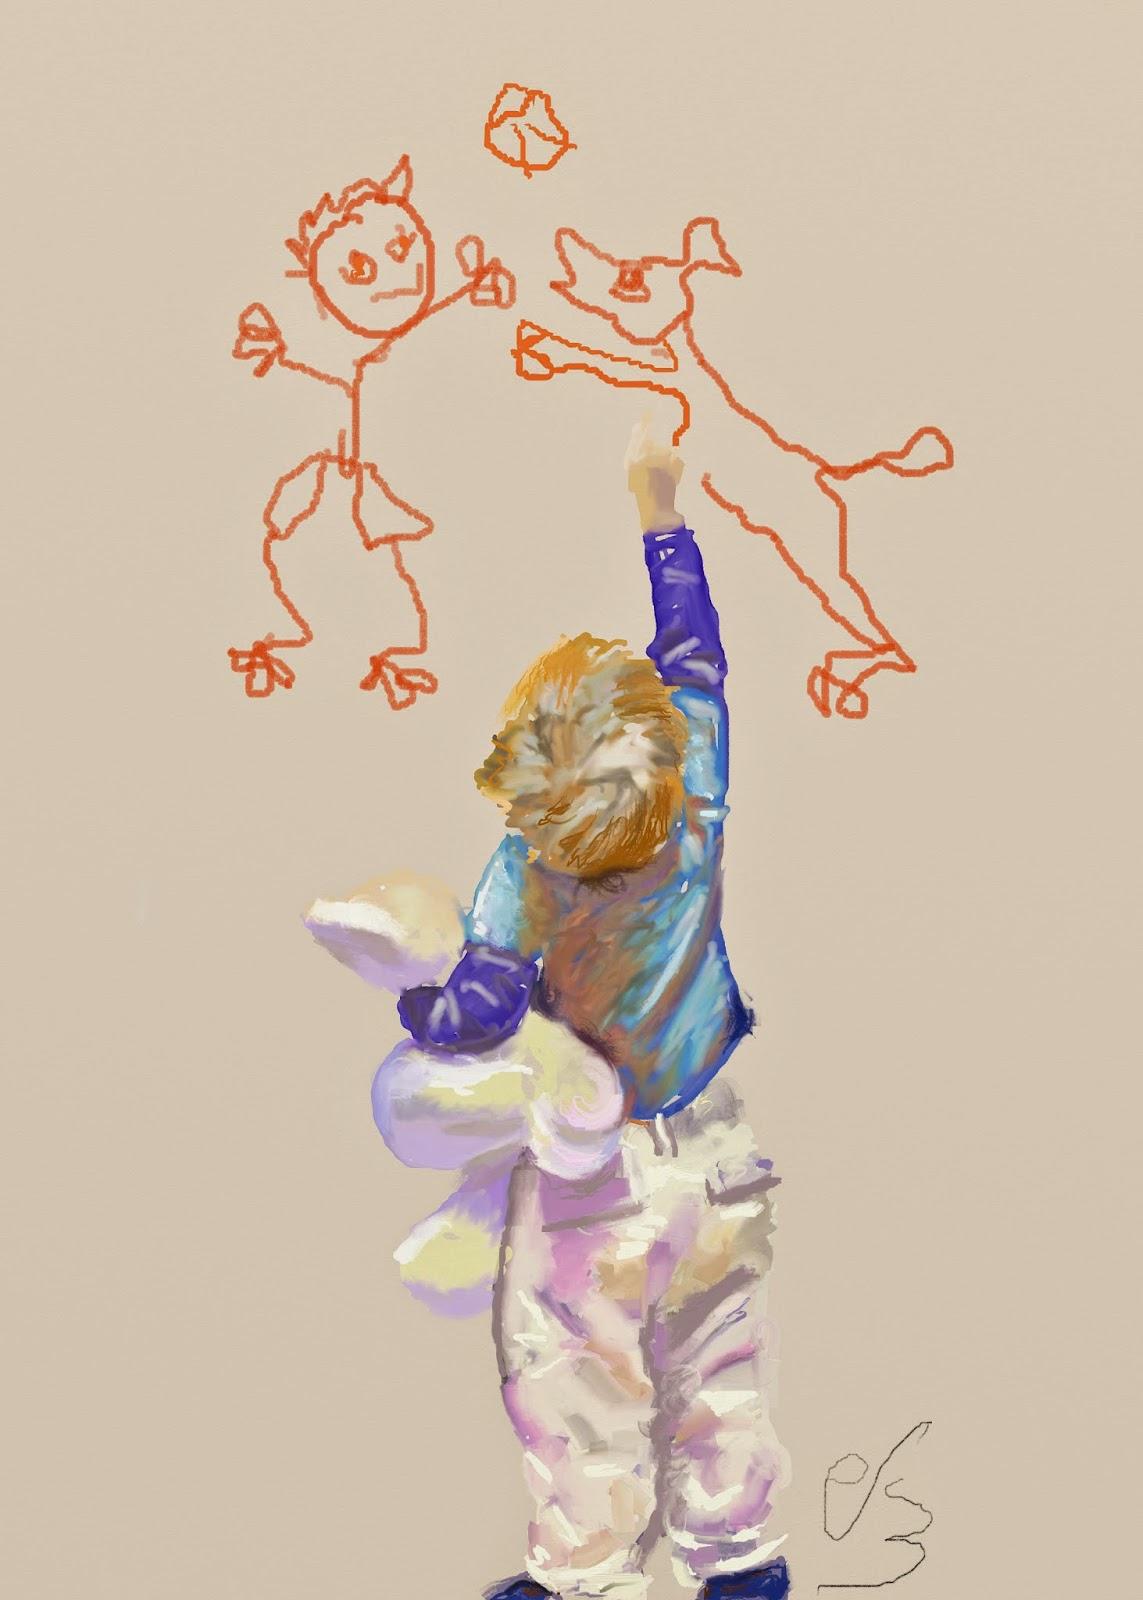 Niño de espaldas dibujando garabatos